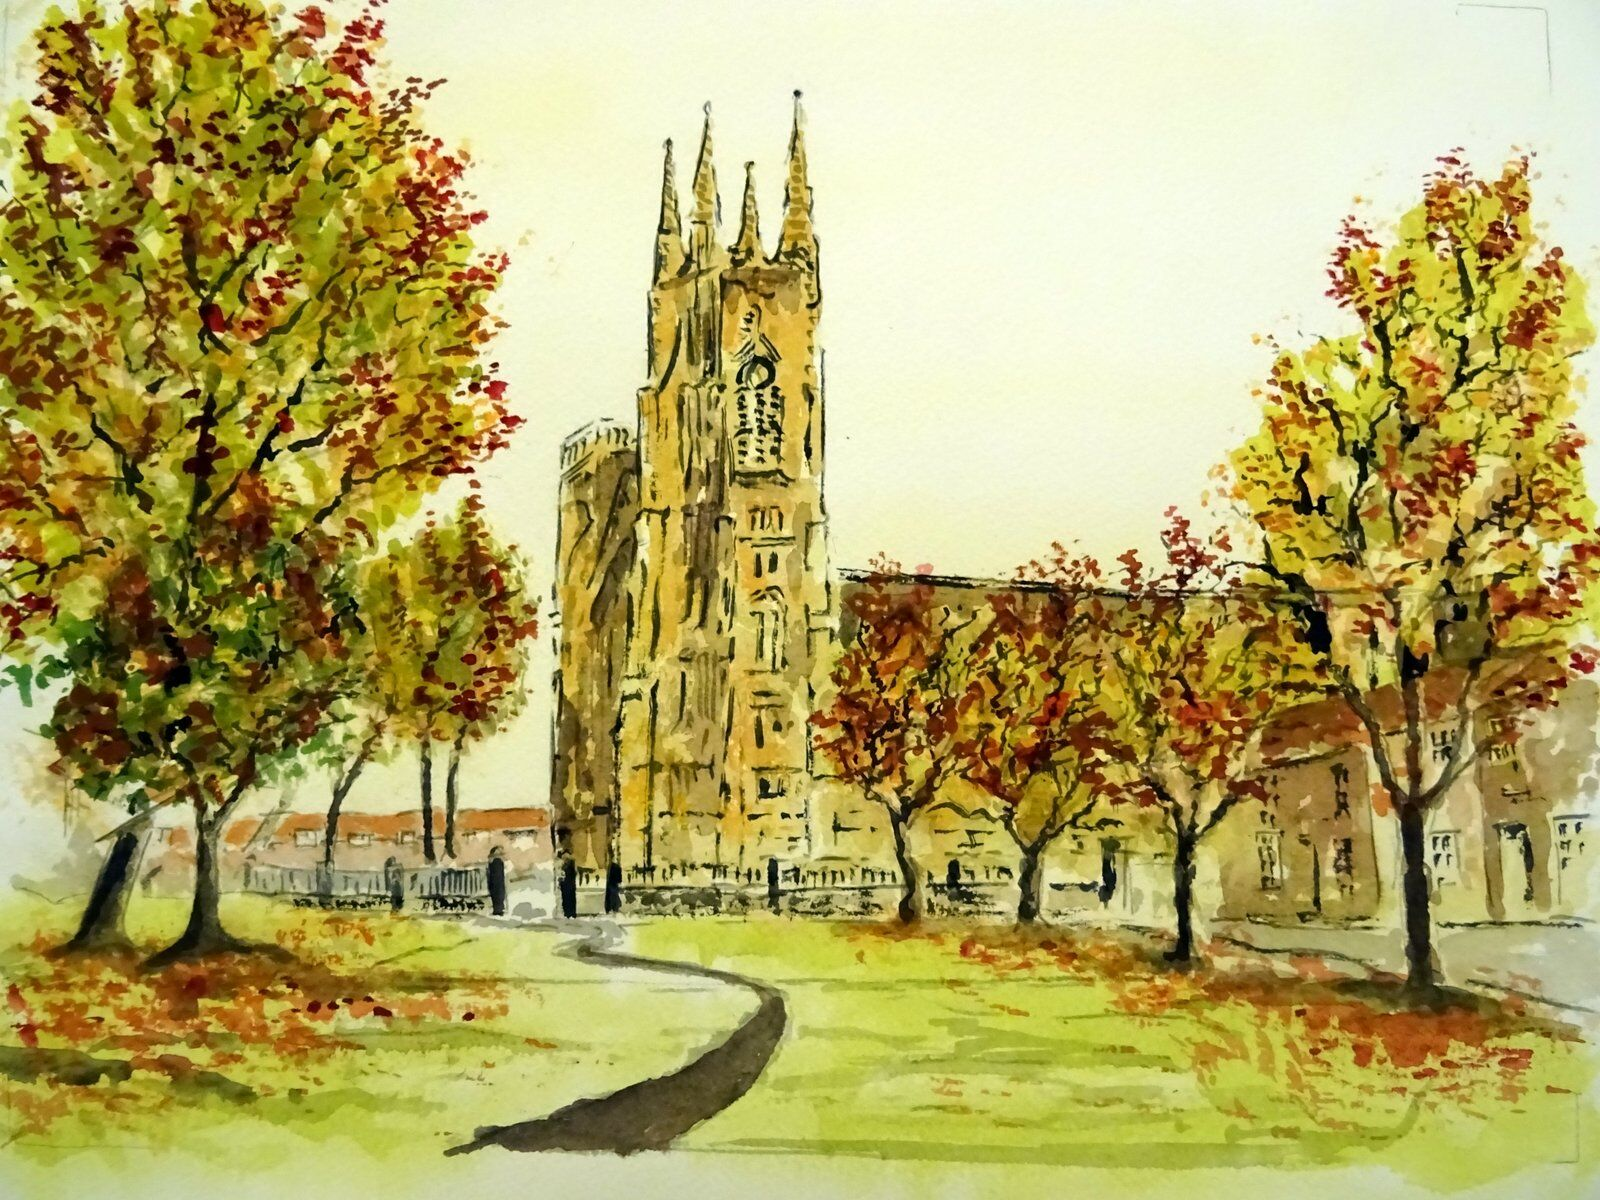 Bridlington Priory